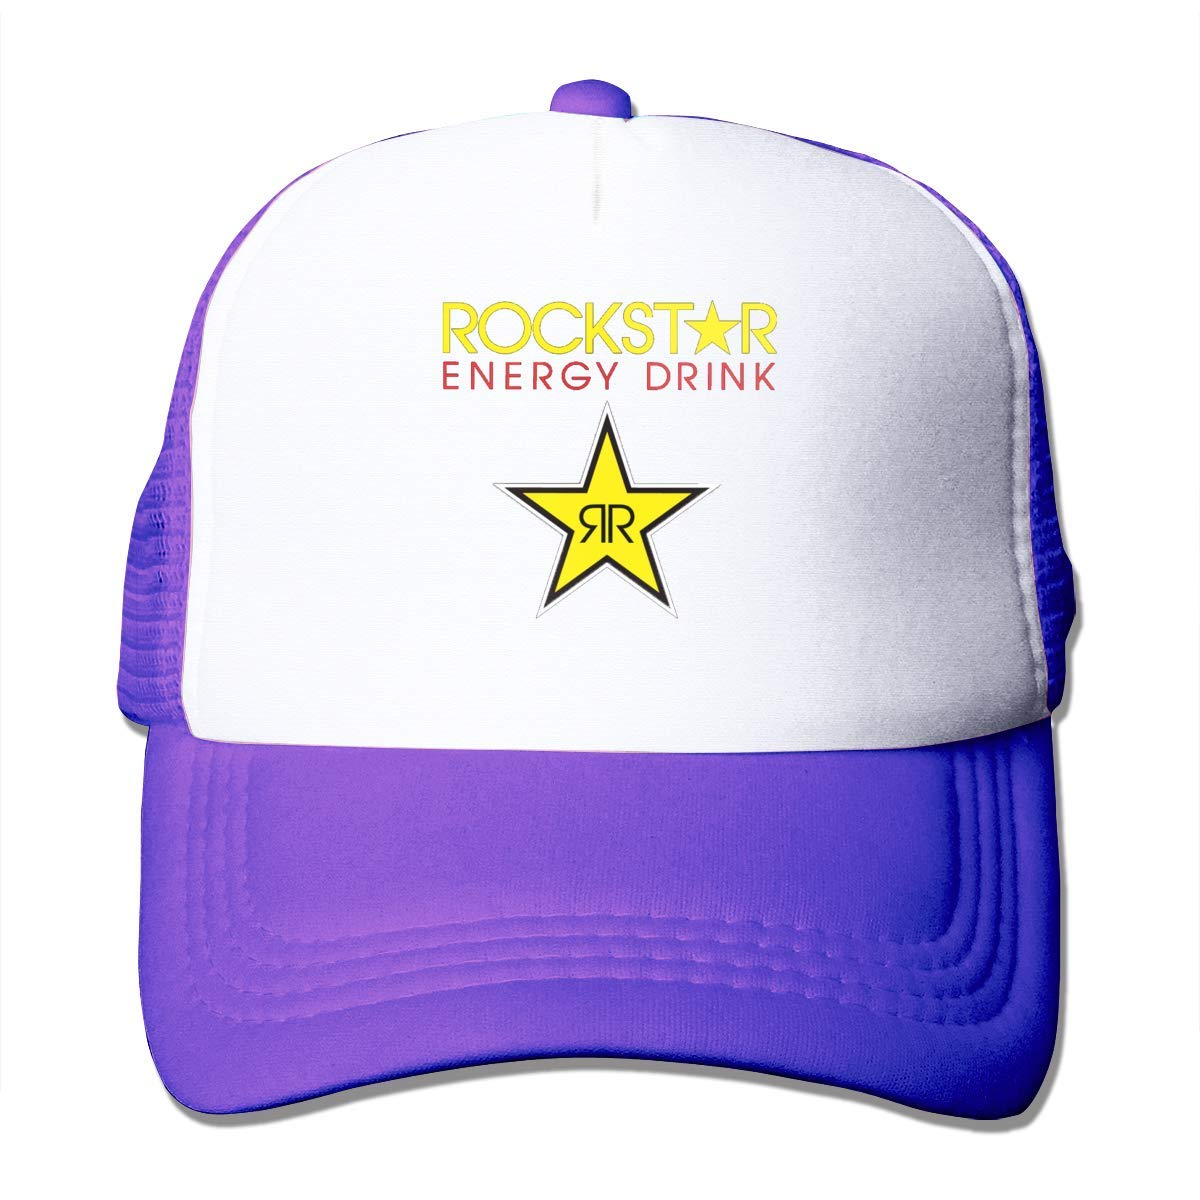 DATG Gorra Unisex Rockstar-Energy-Drink Superlite Relajada ...